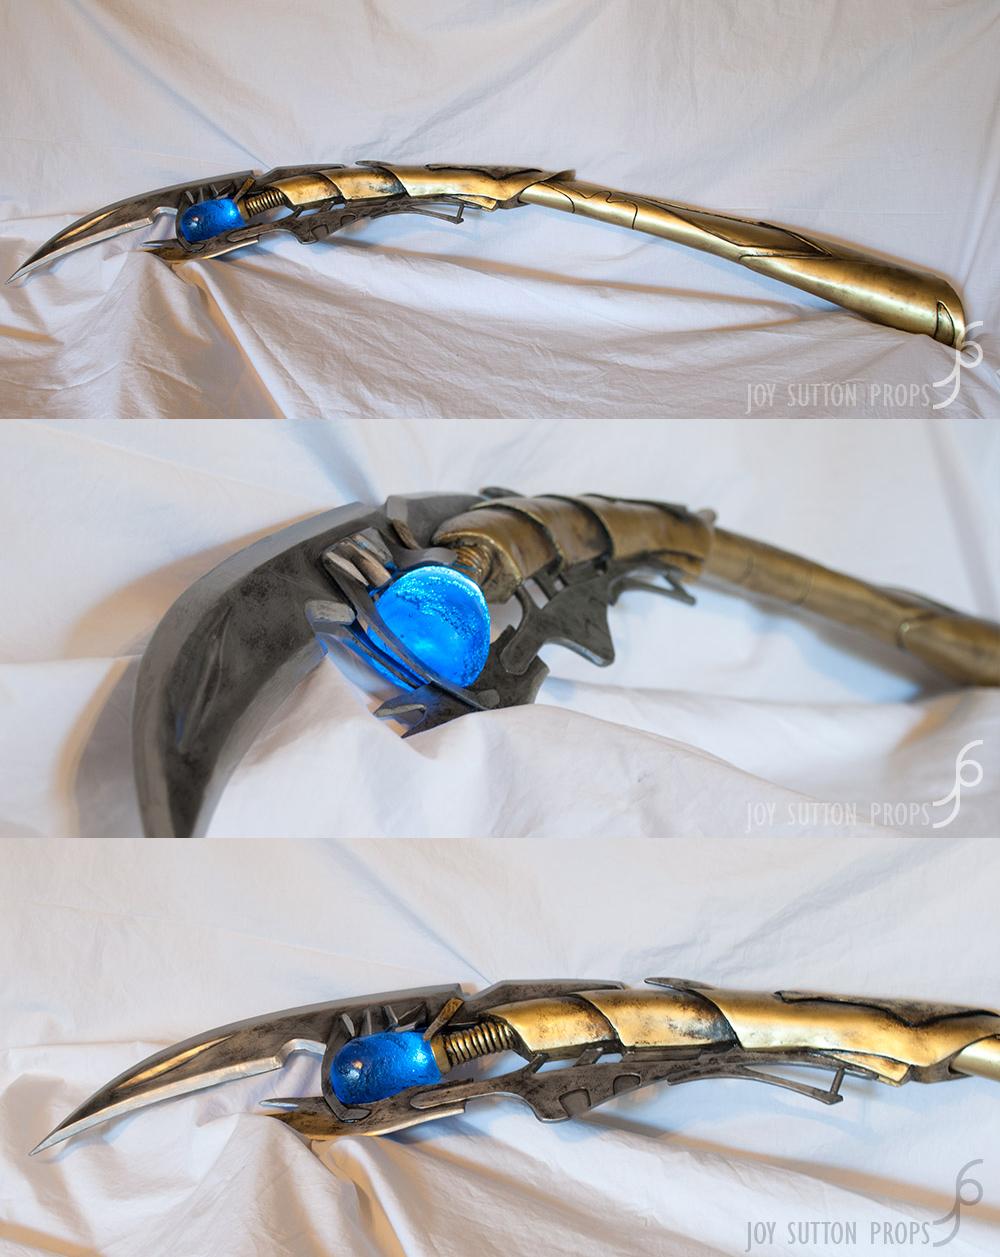 Loki's Scepter from The Avengers by Vogelkop